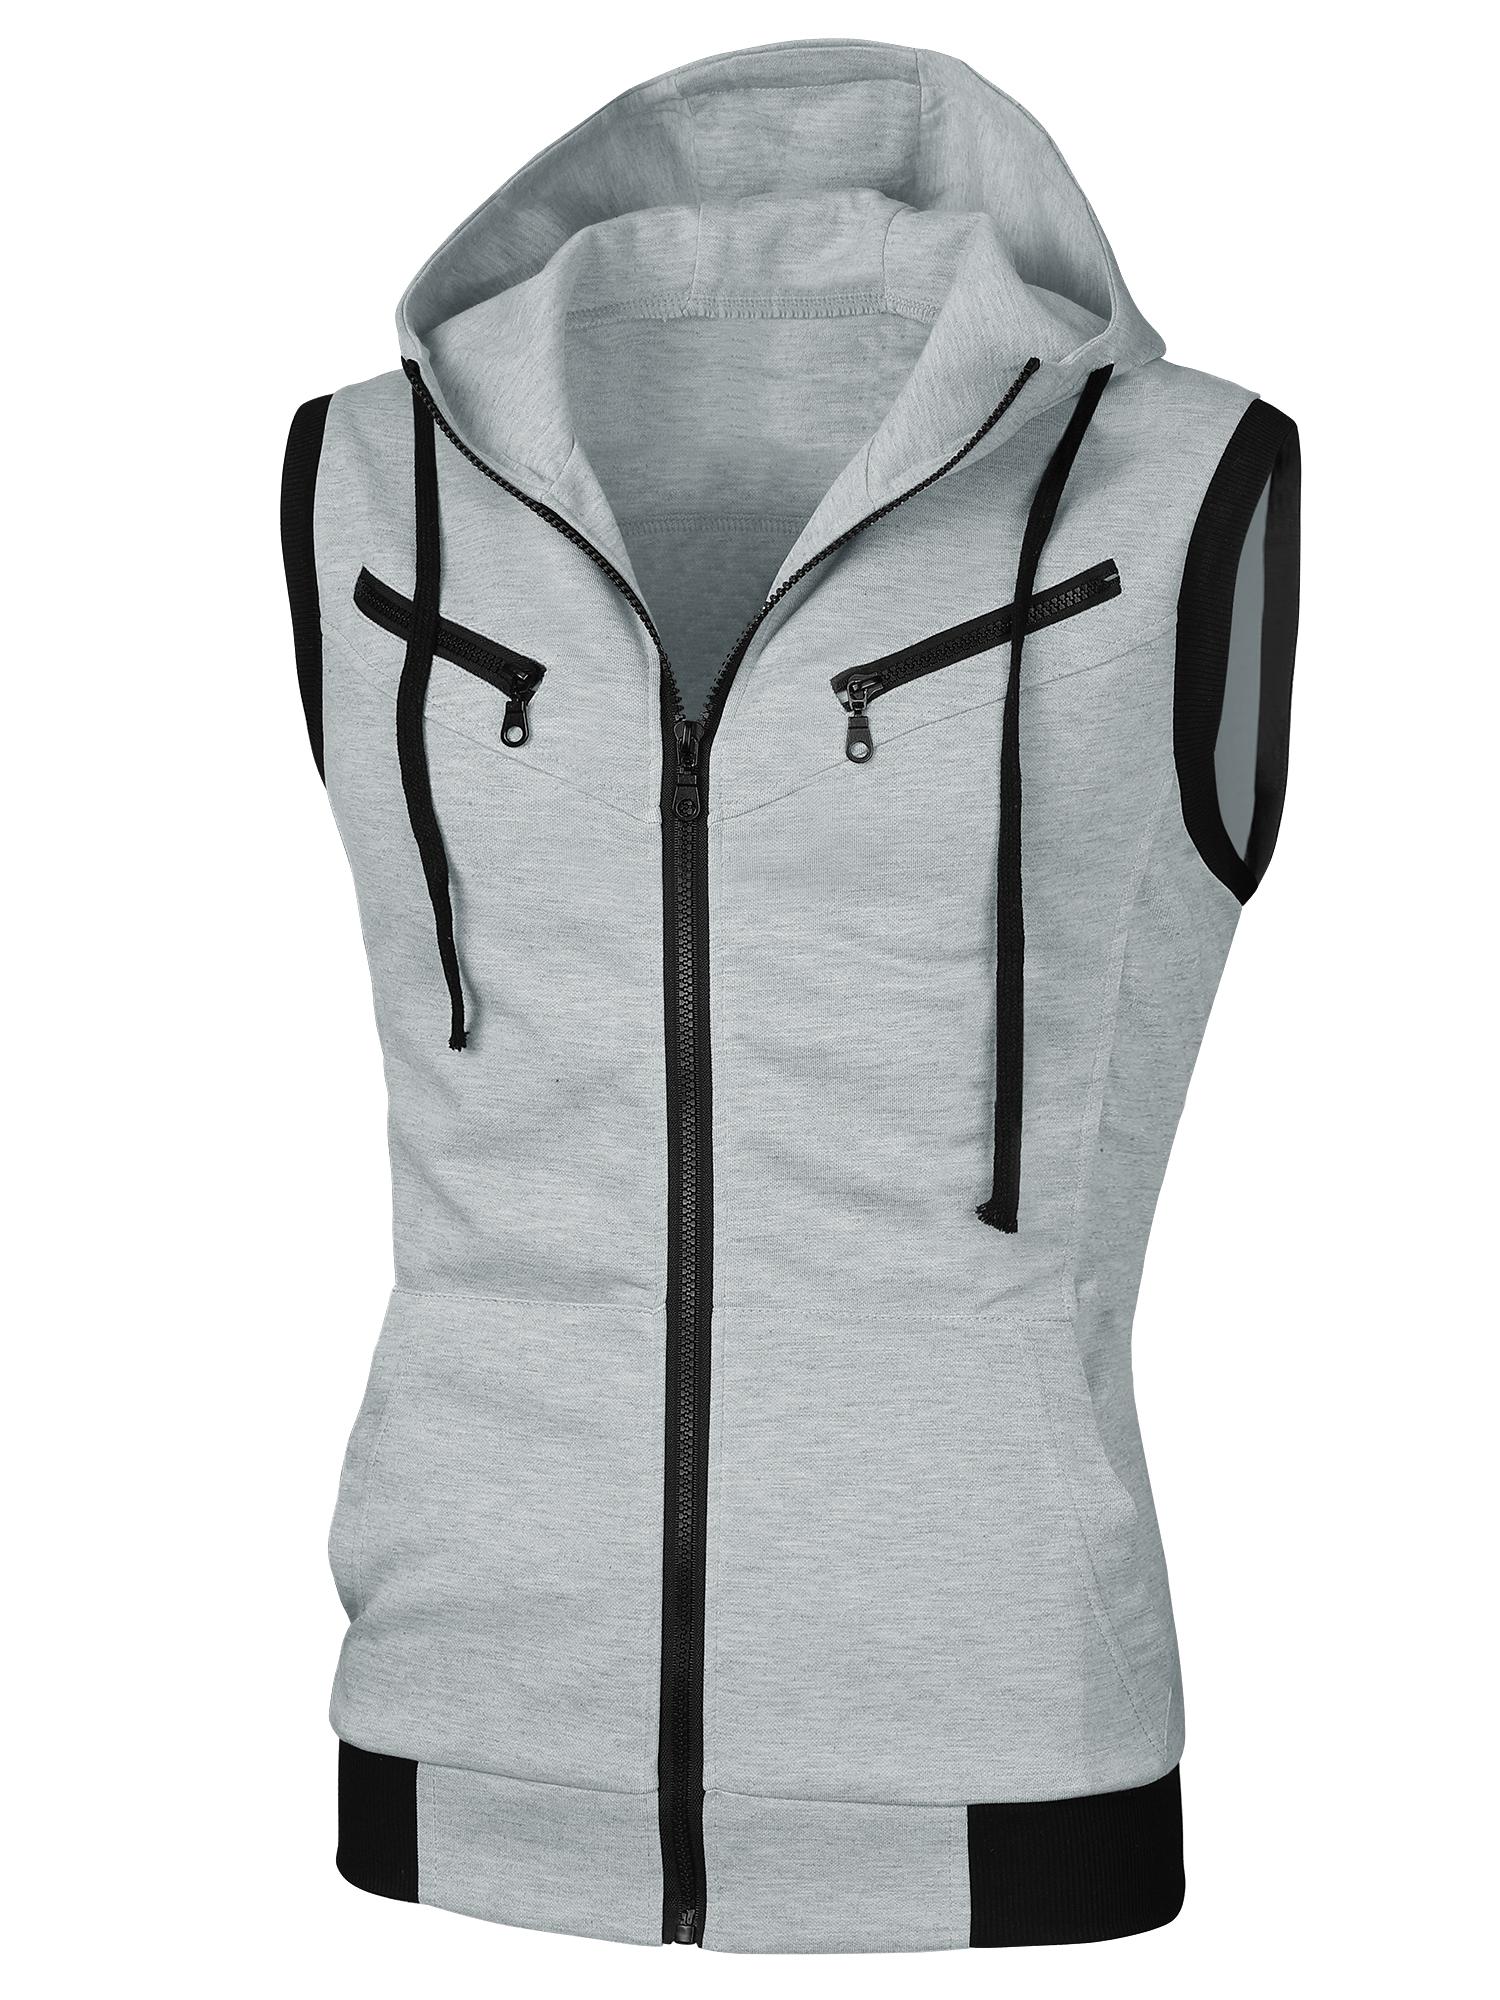 Men Sleeveless Drawcord Design Fashion Hoodie Vest Heather Gray M